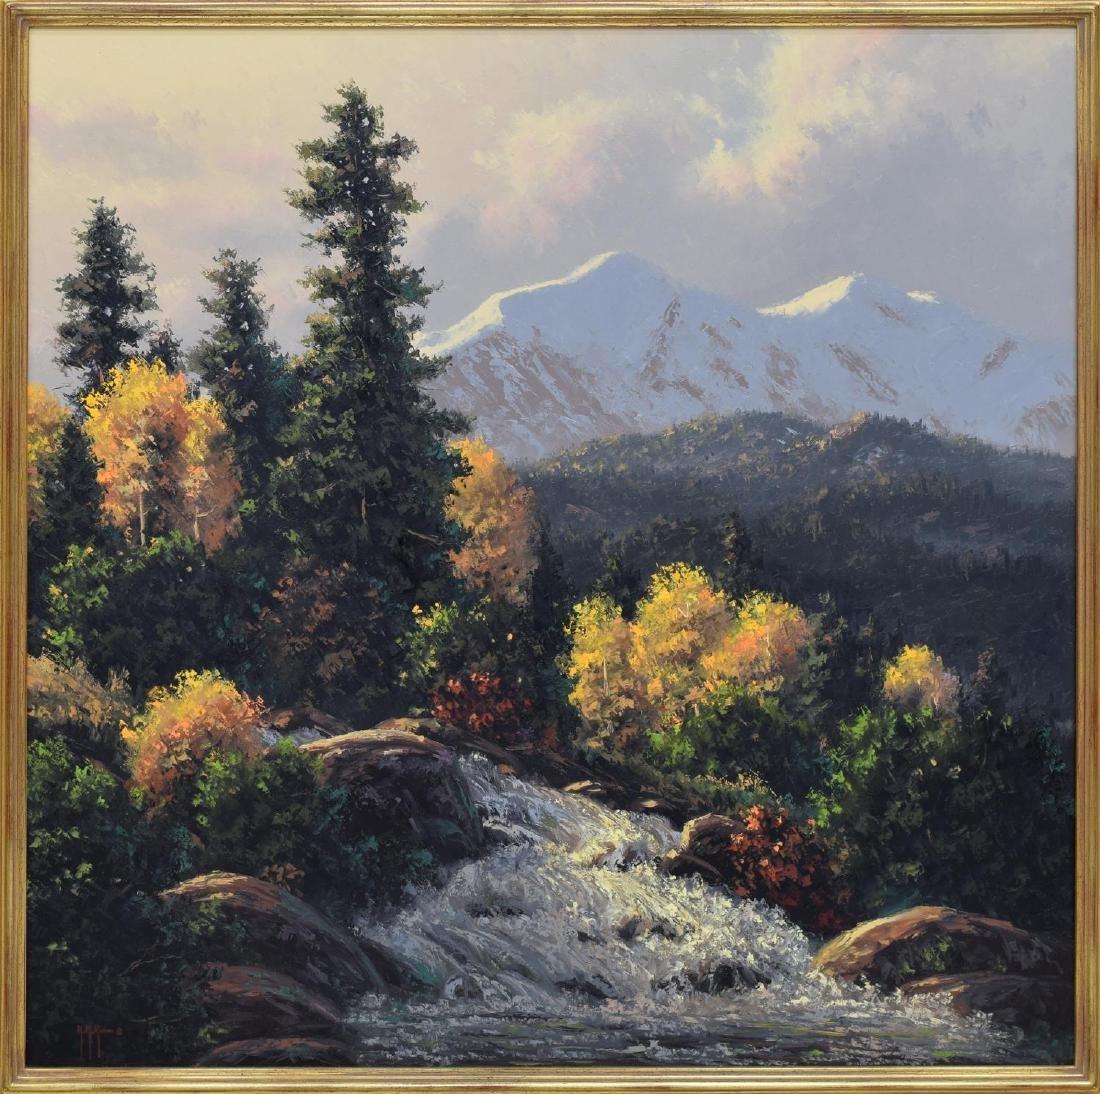 KENNY McKENNA (B. 1950) MOUNTAIN WATERFALLS